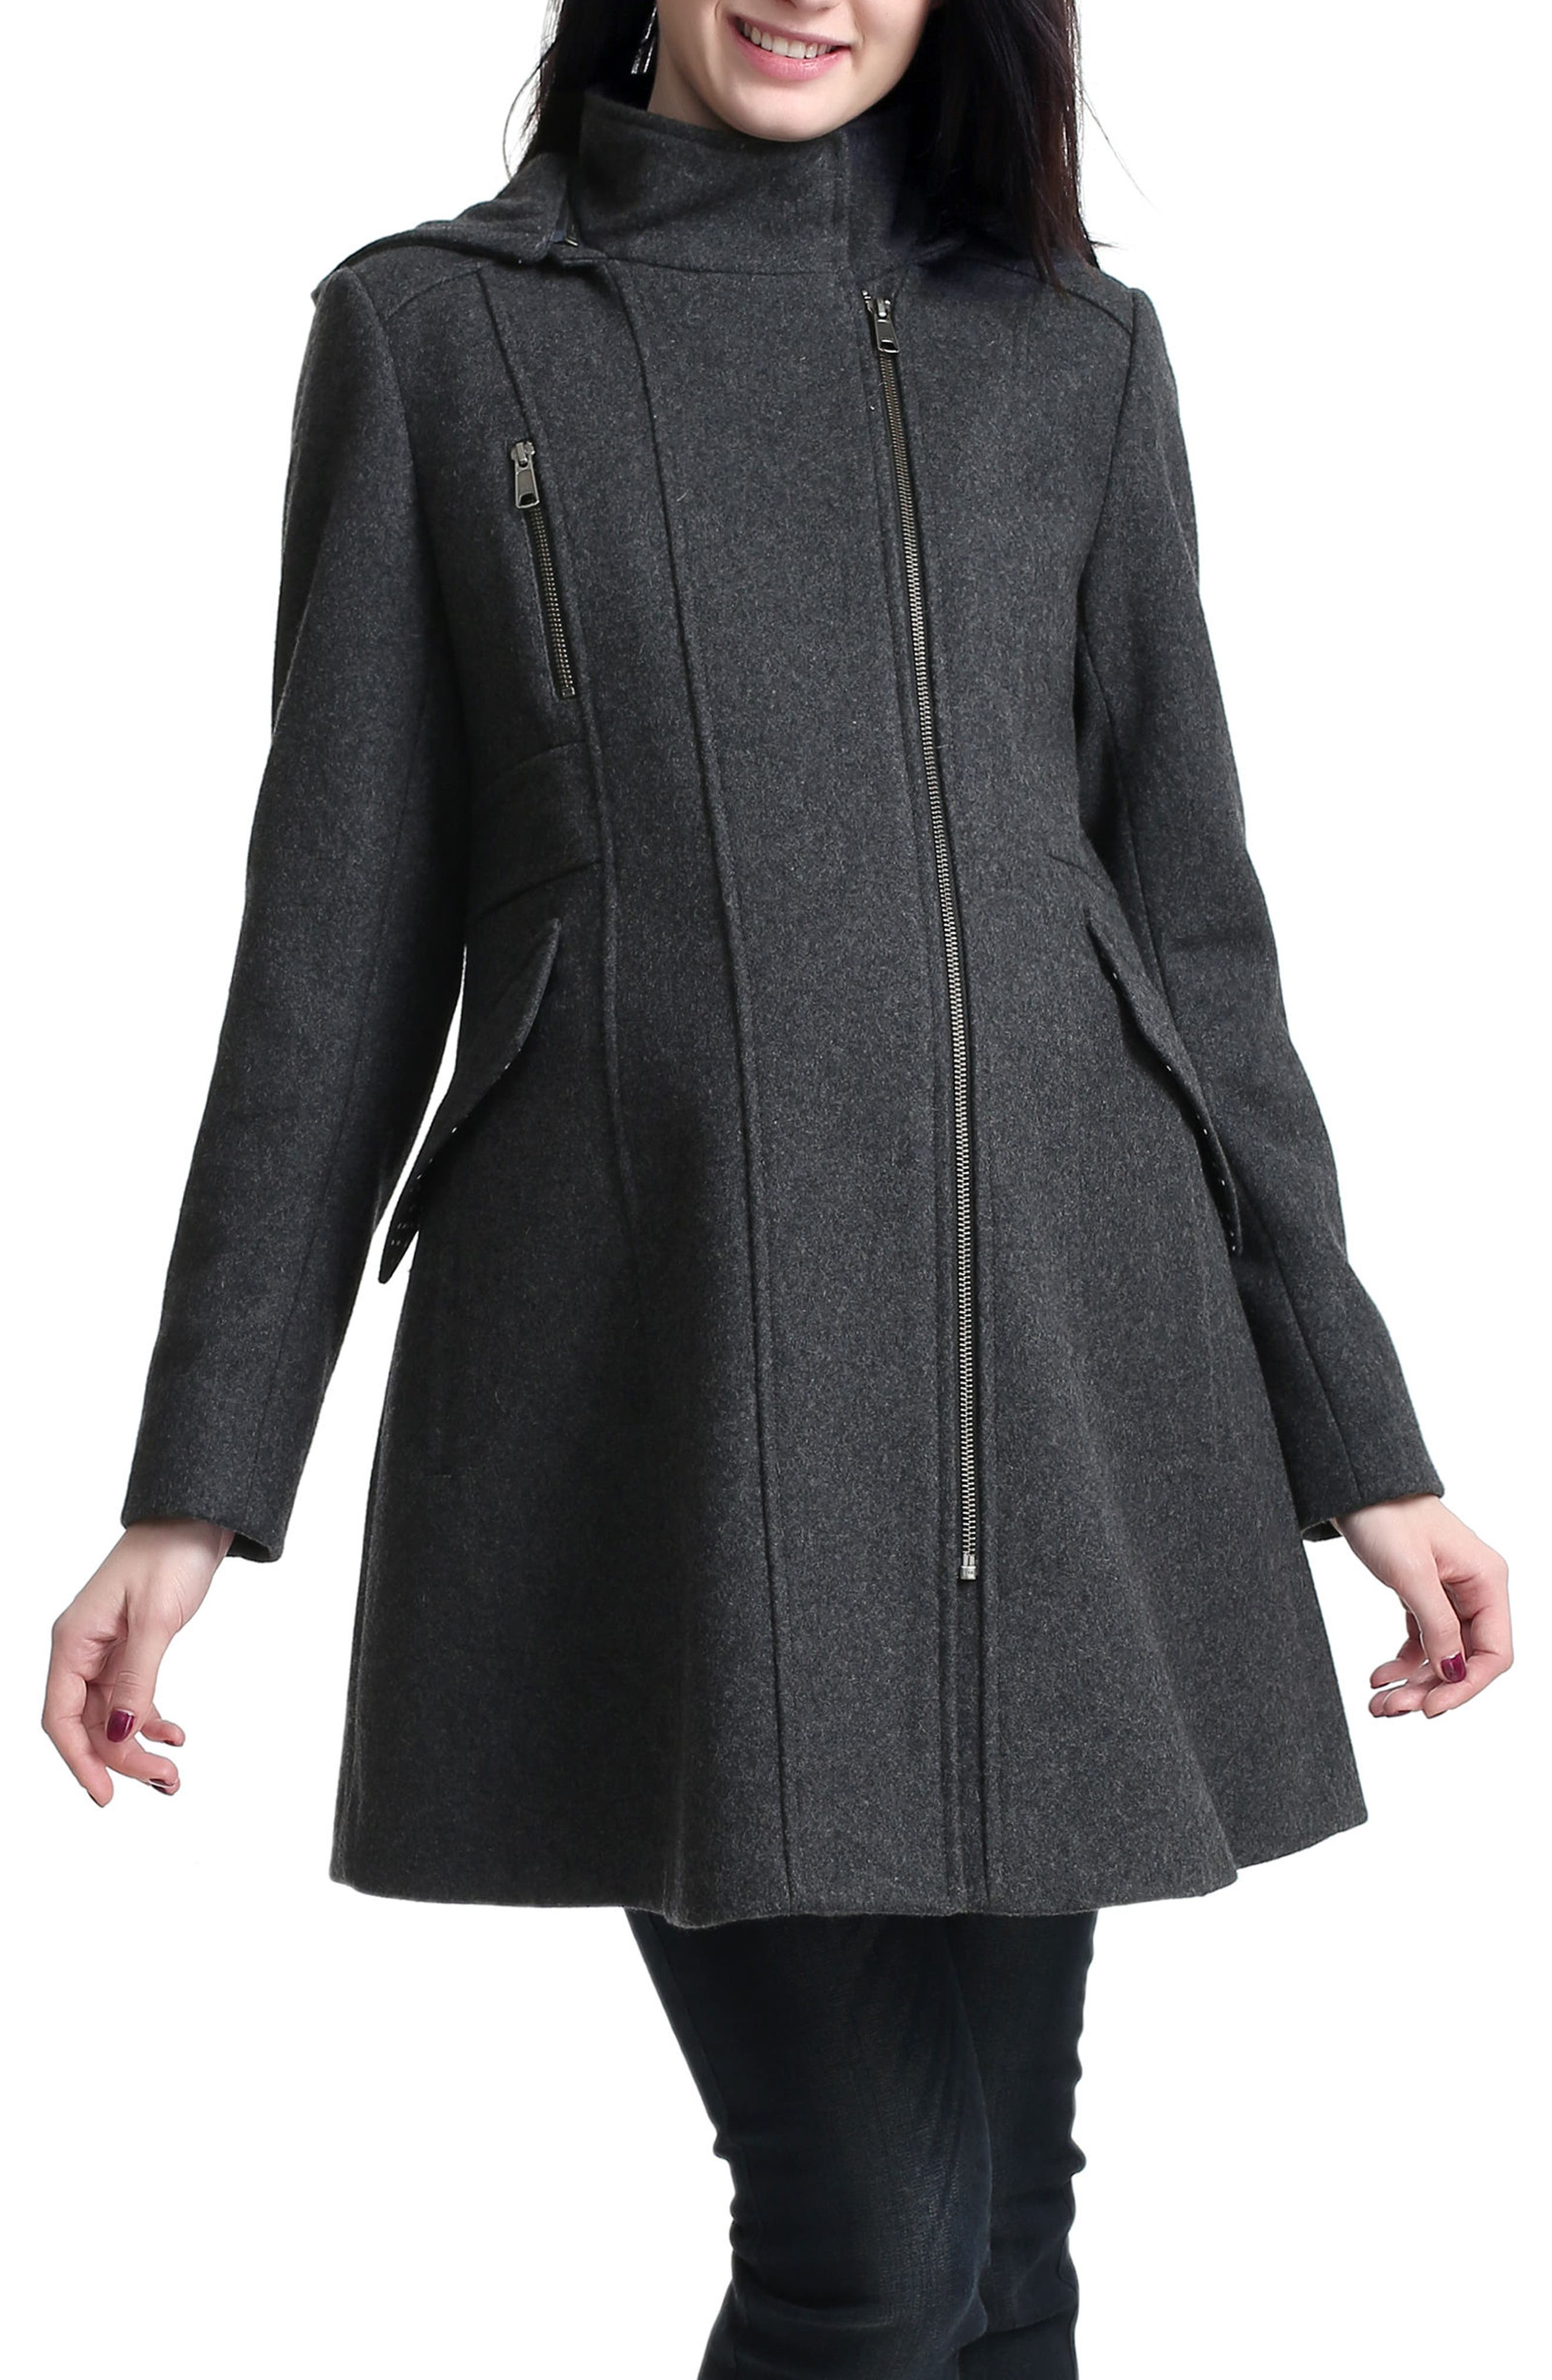 KIMI AND KAI Cordella Wool Blend Hooded Maternity Coat, Main, color, DARK HEATHER GRAY